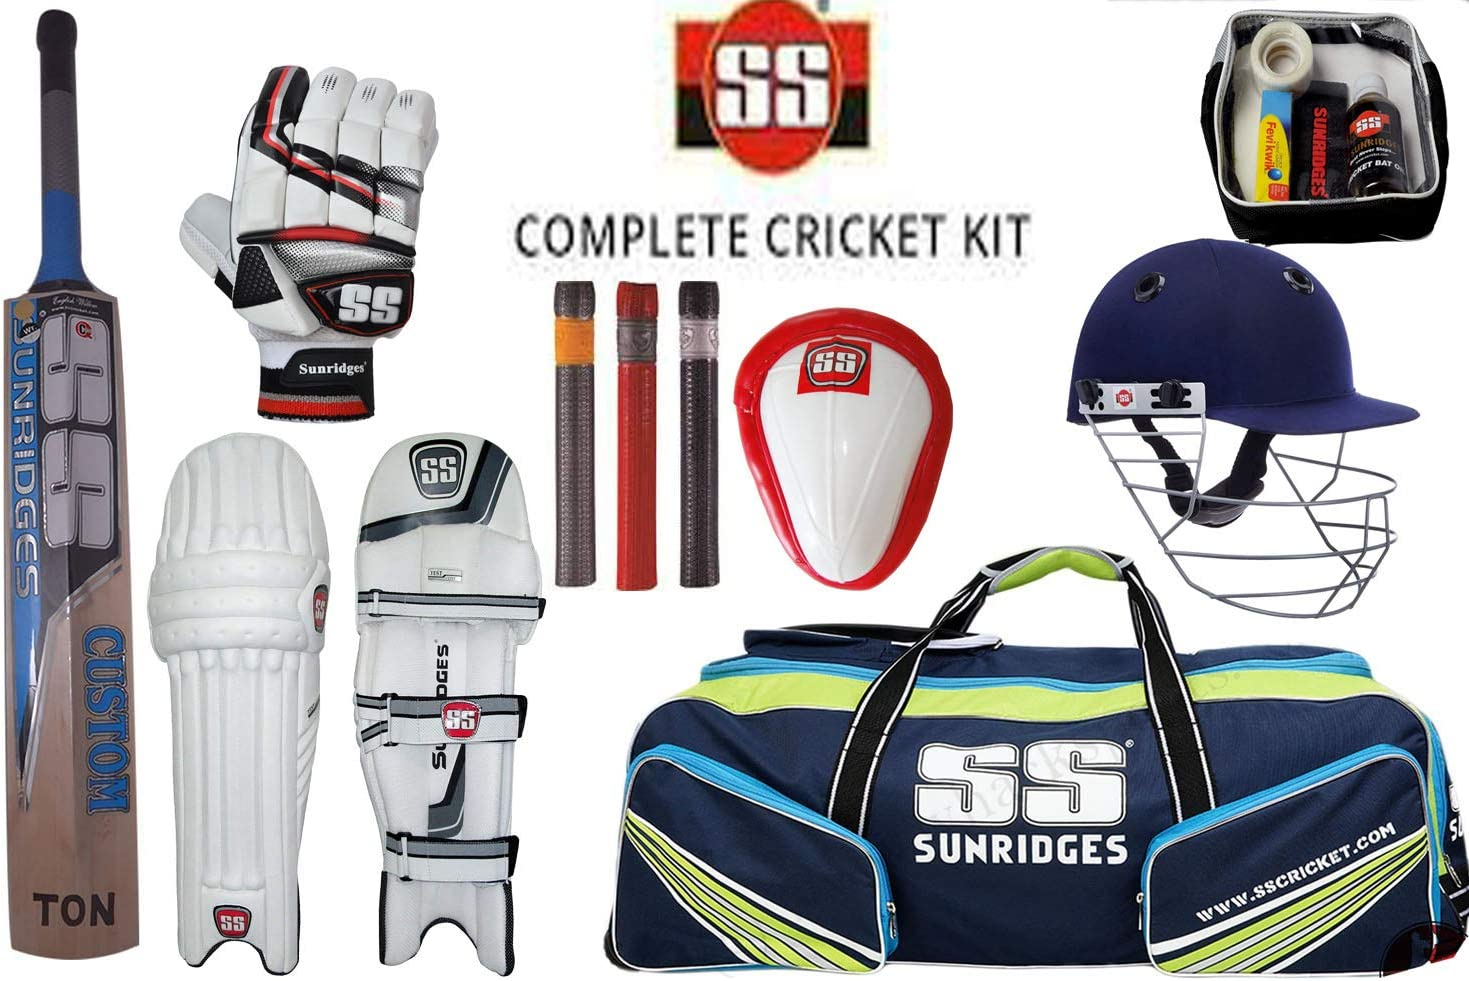 Cricket Kit Harrow complete set Bat ball pads gloves helmet legguard pad box bag